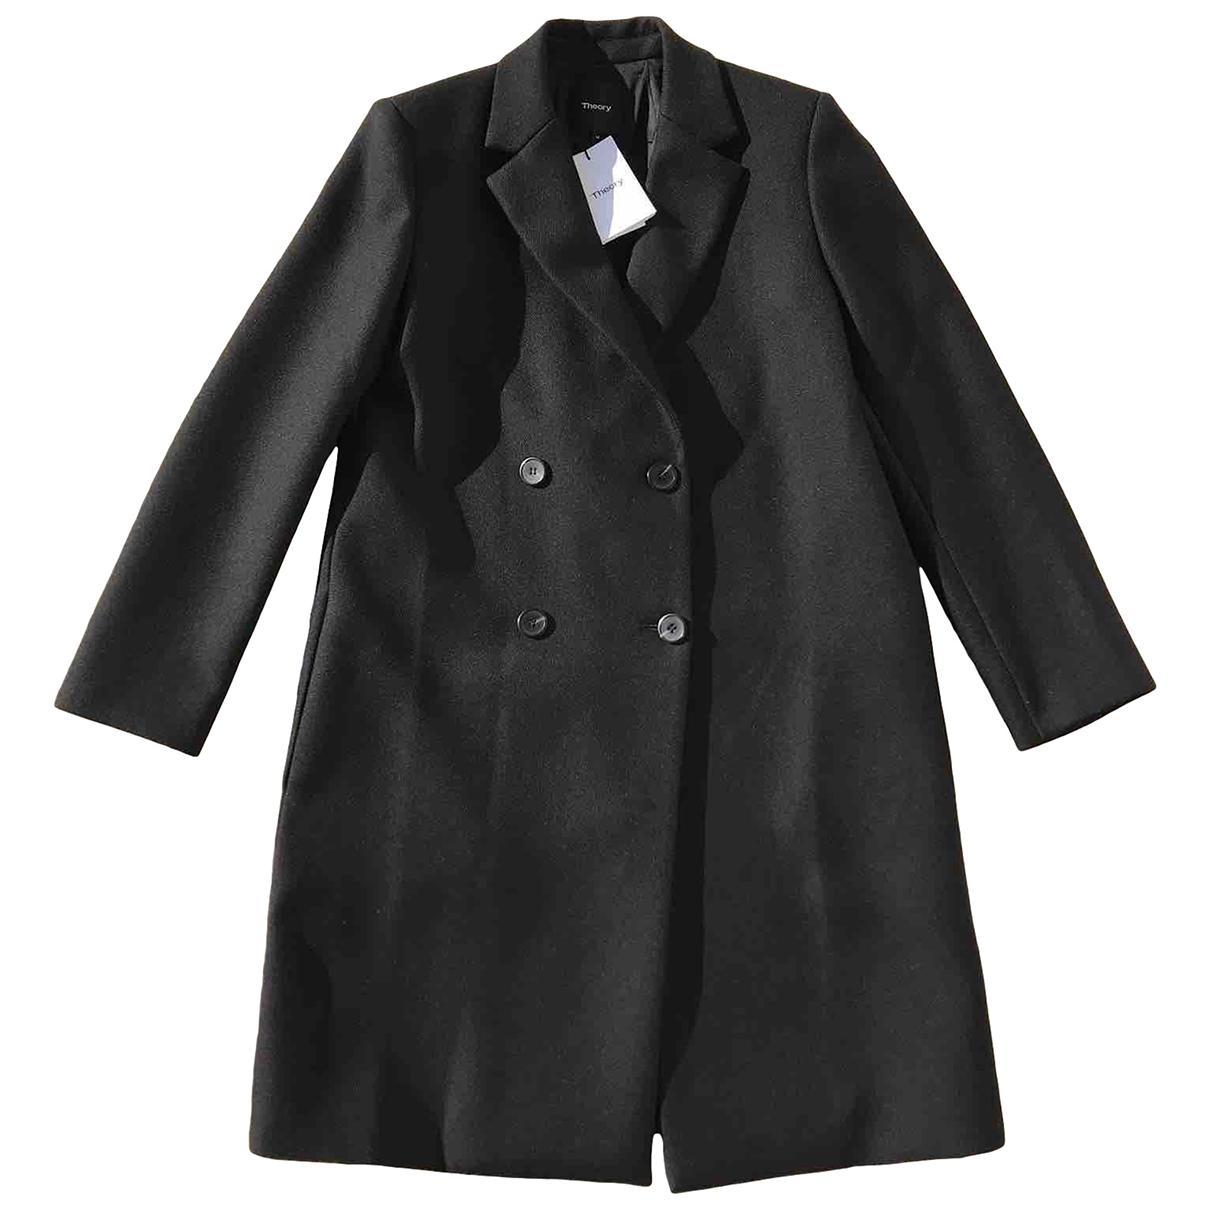 Theory \N Black coat for Women M International